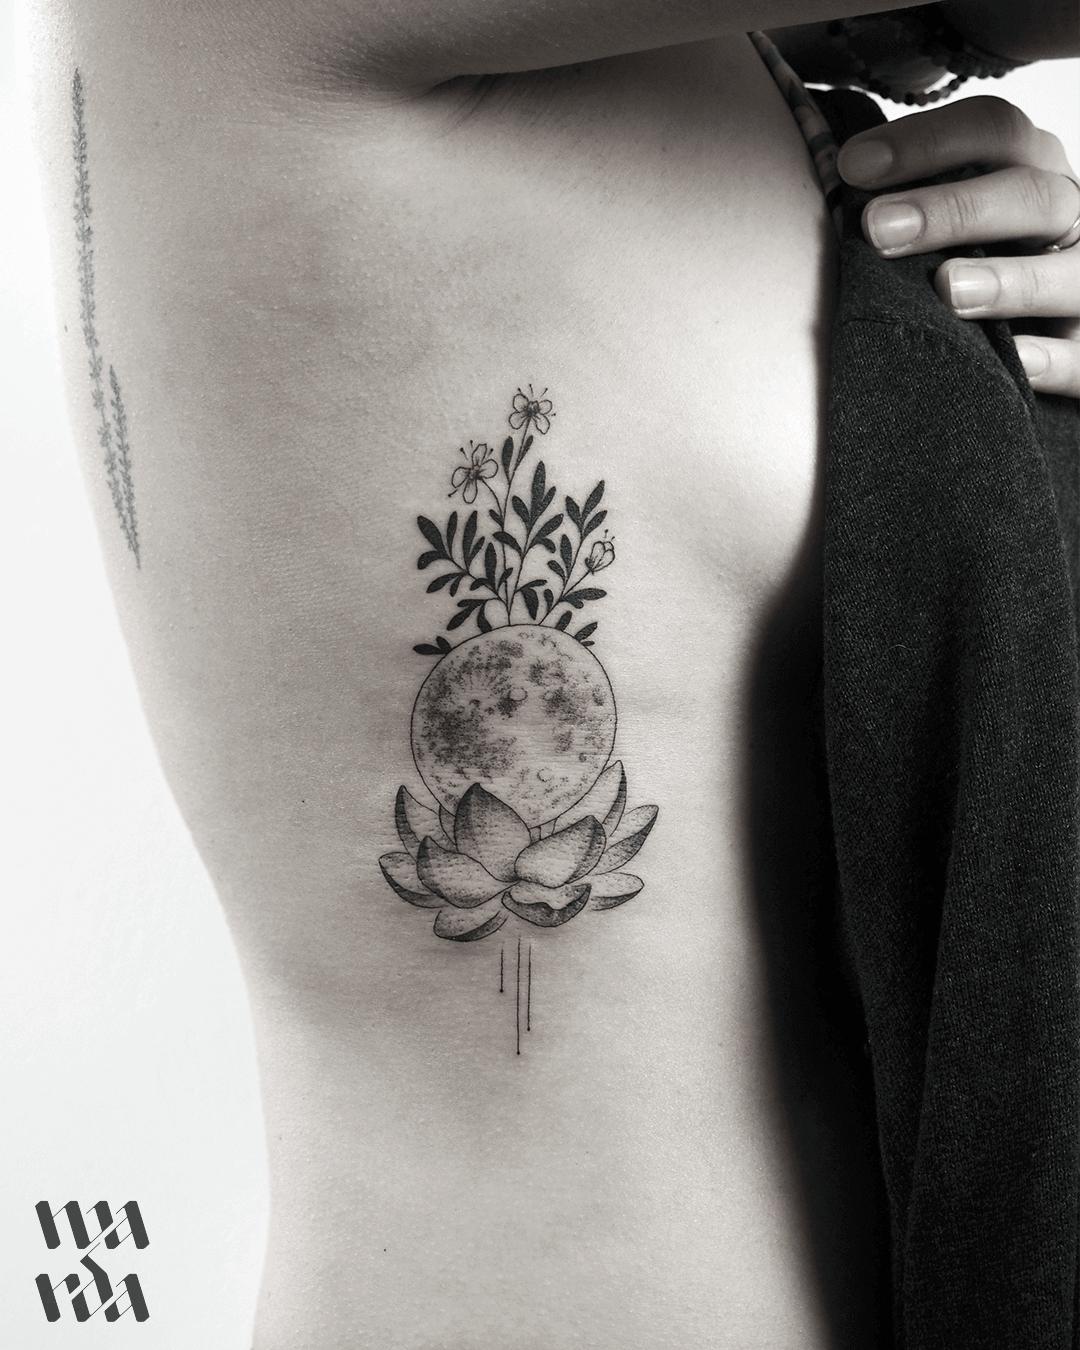 Full moon and Lotus flower tattoo